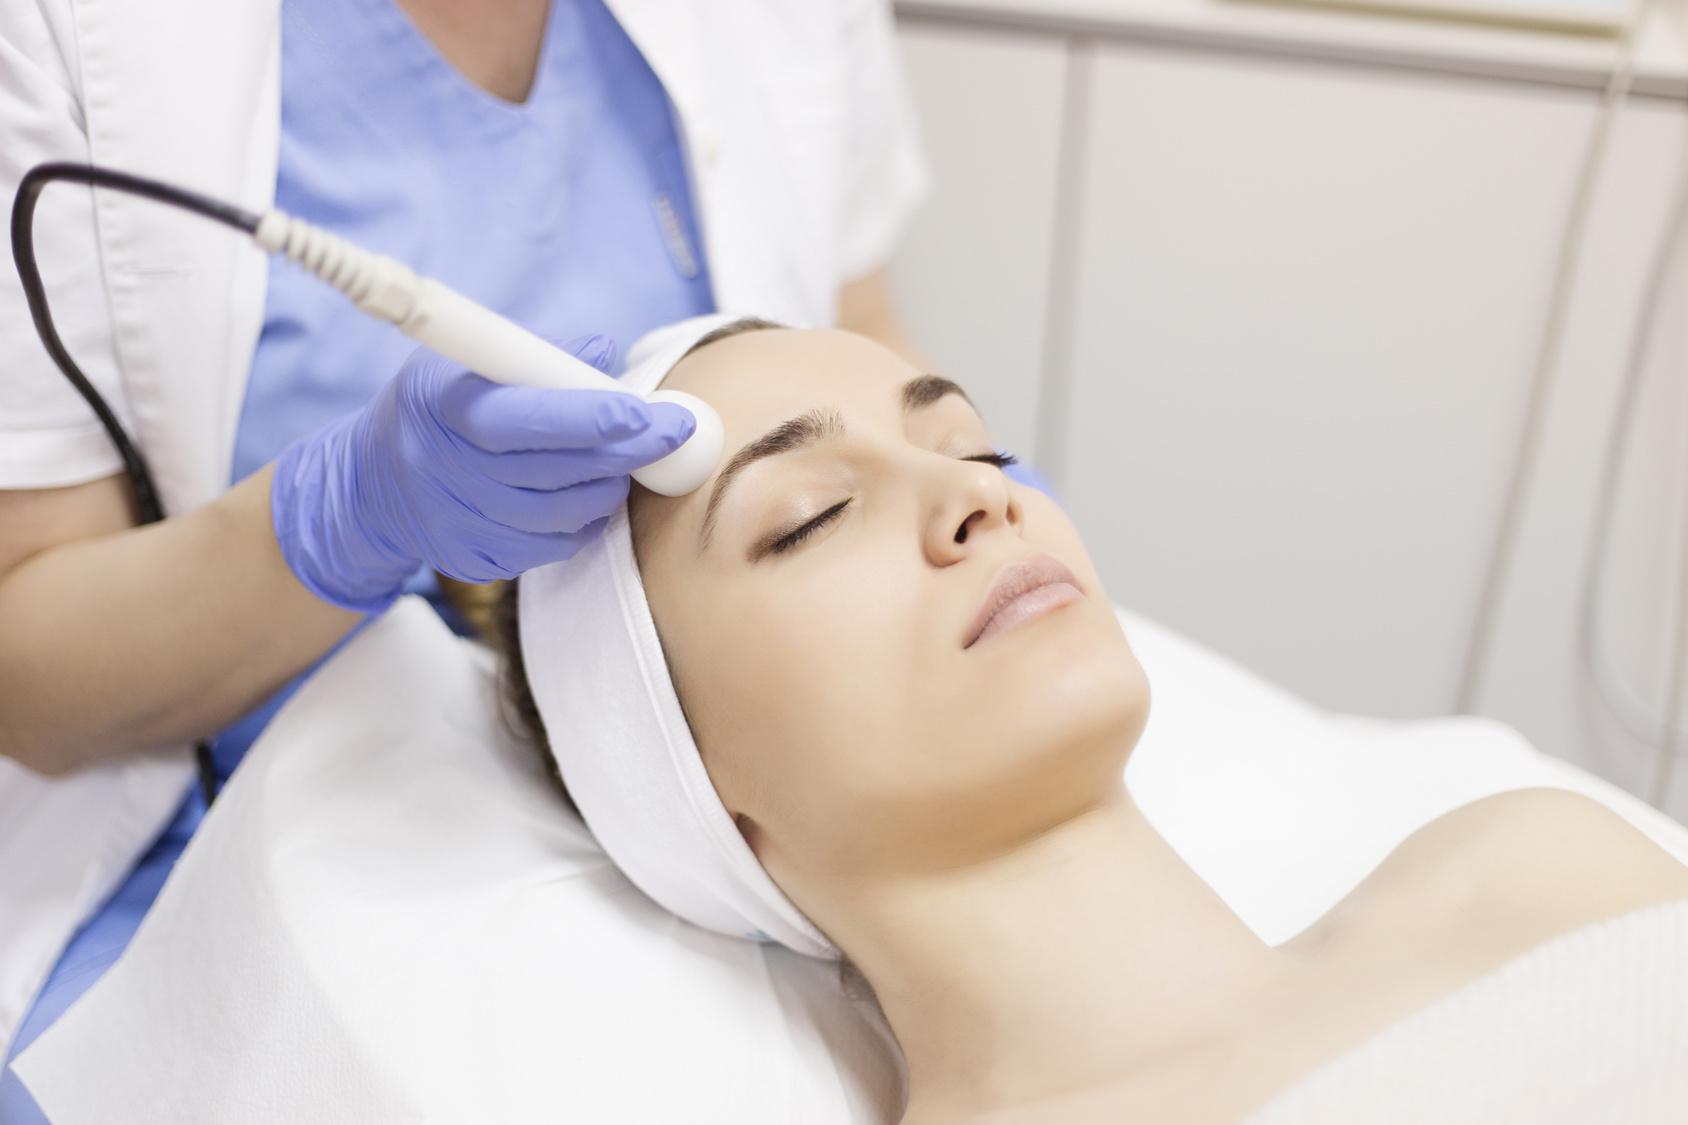 Skin care. Young woman receiving facial beauty treatment. Facial